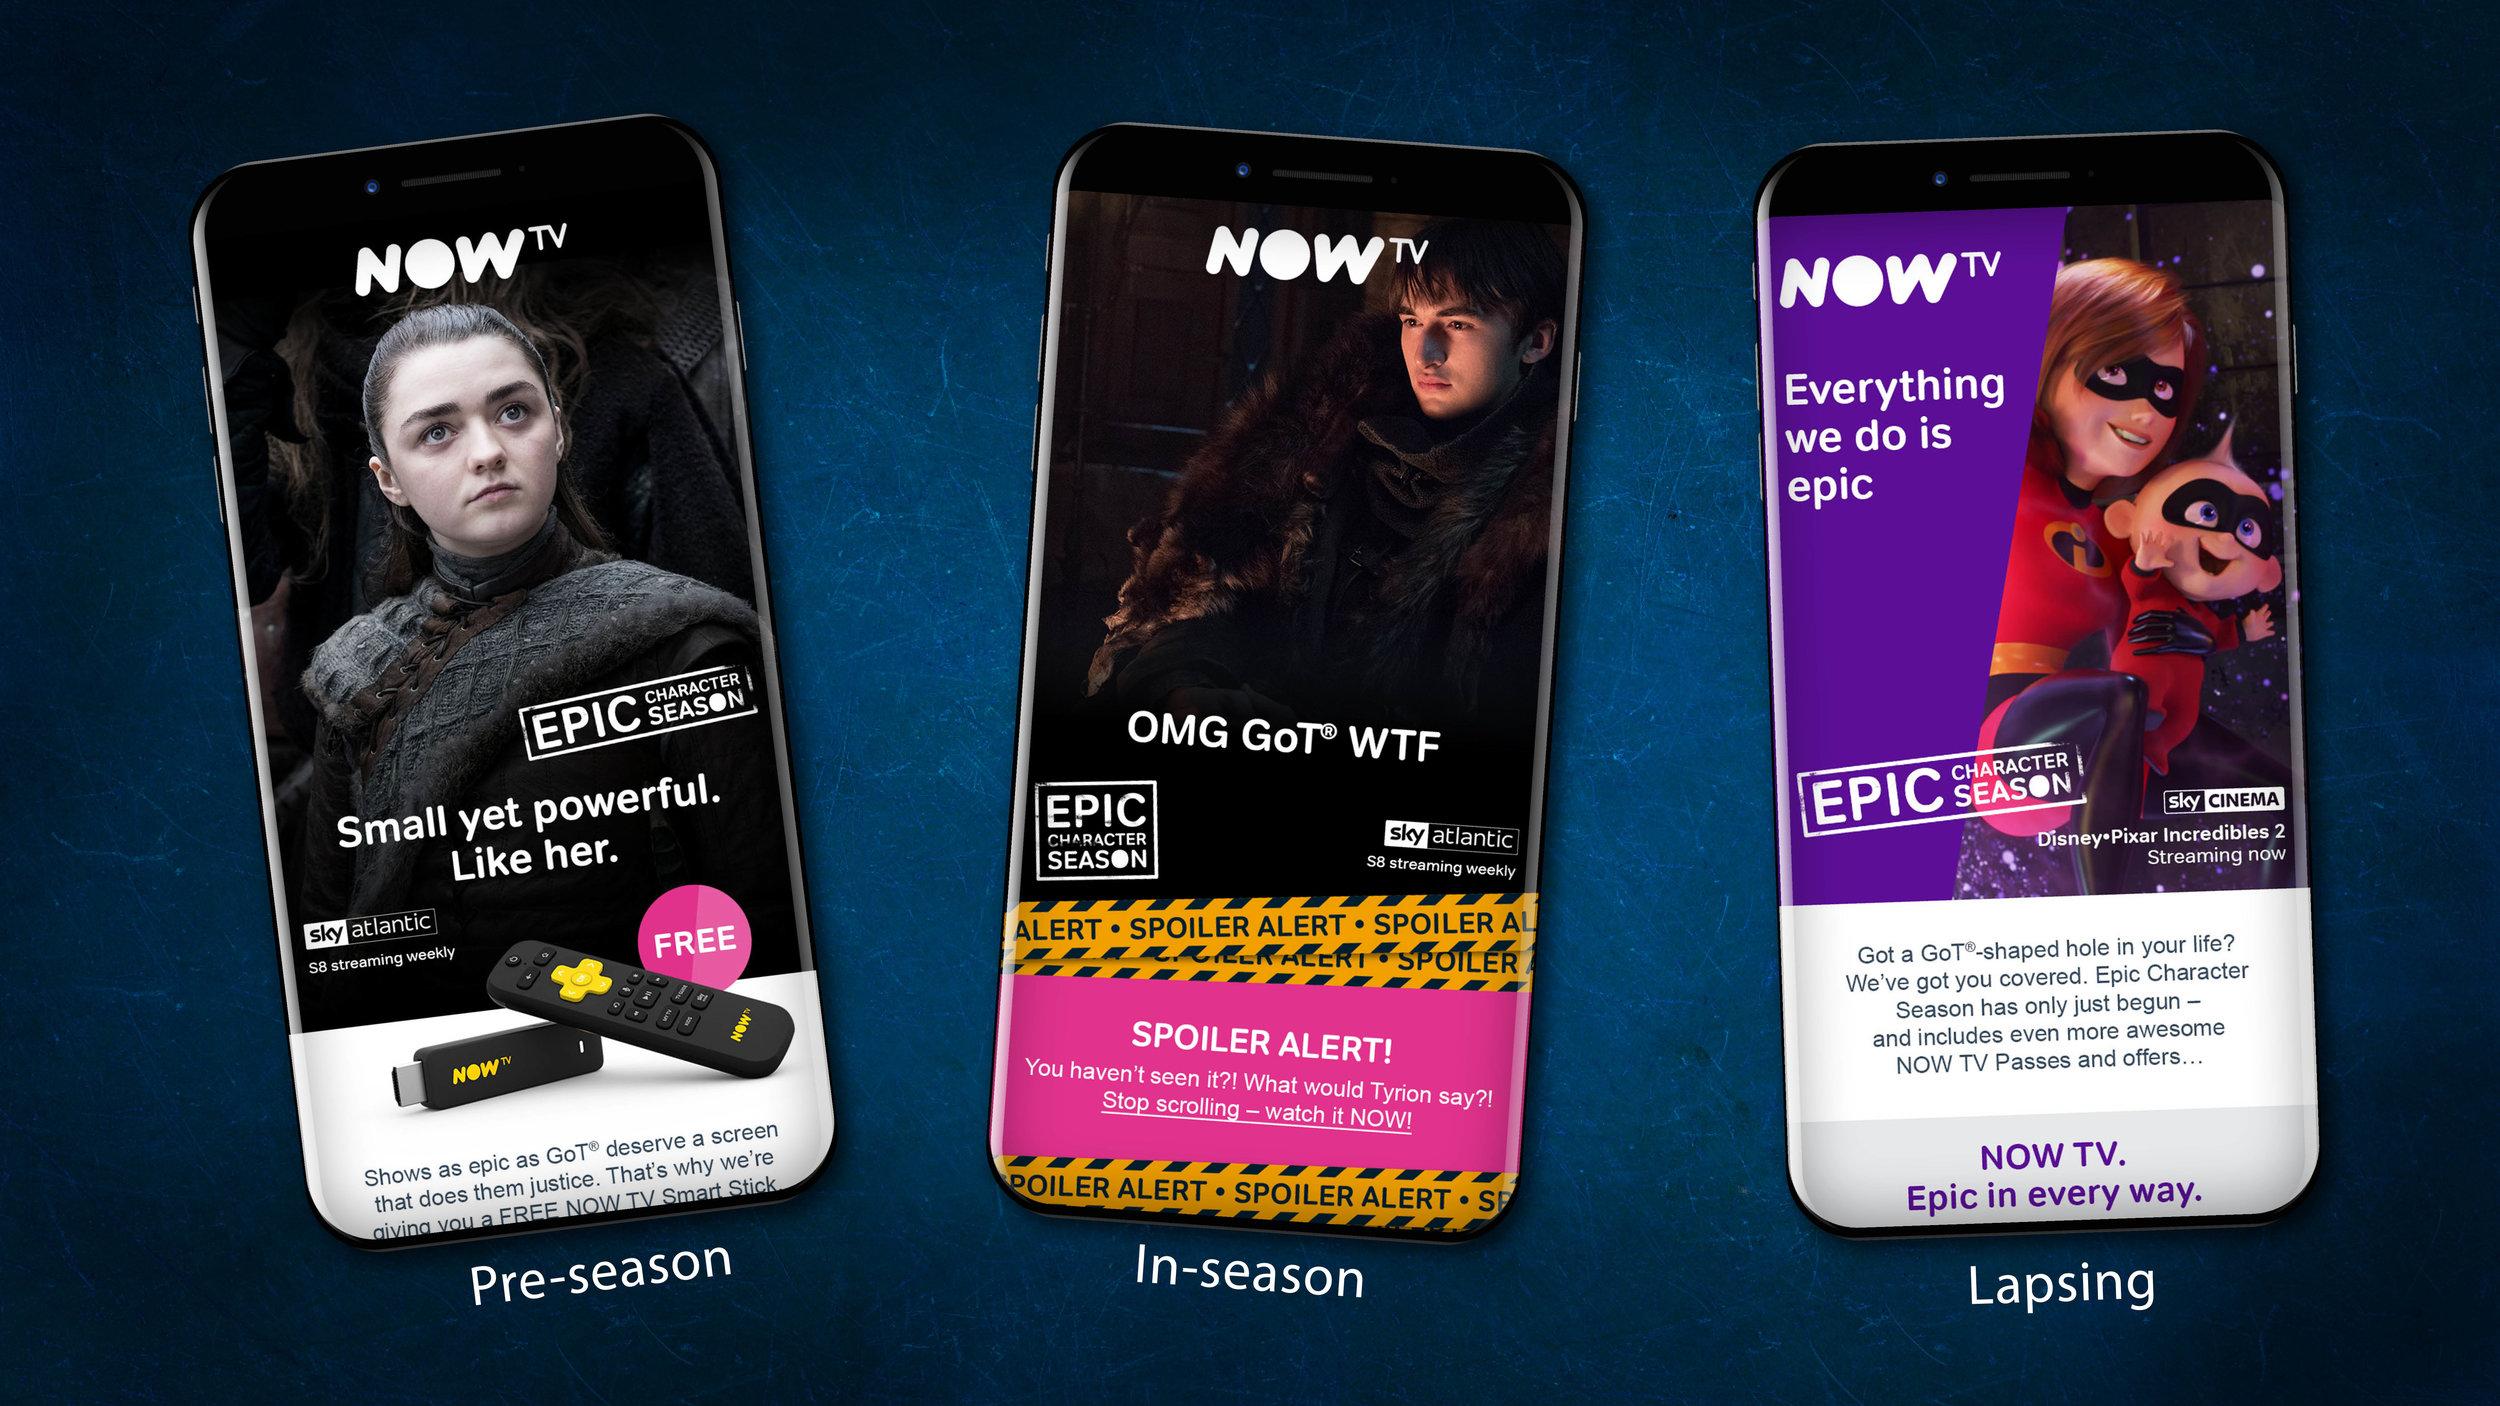 NowTv+Game+of+Thrones_Short3.jpg